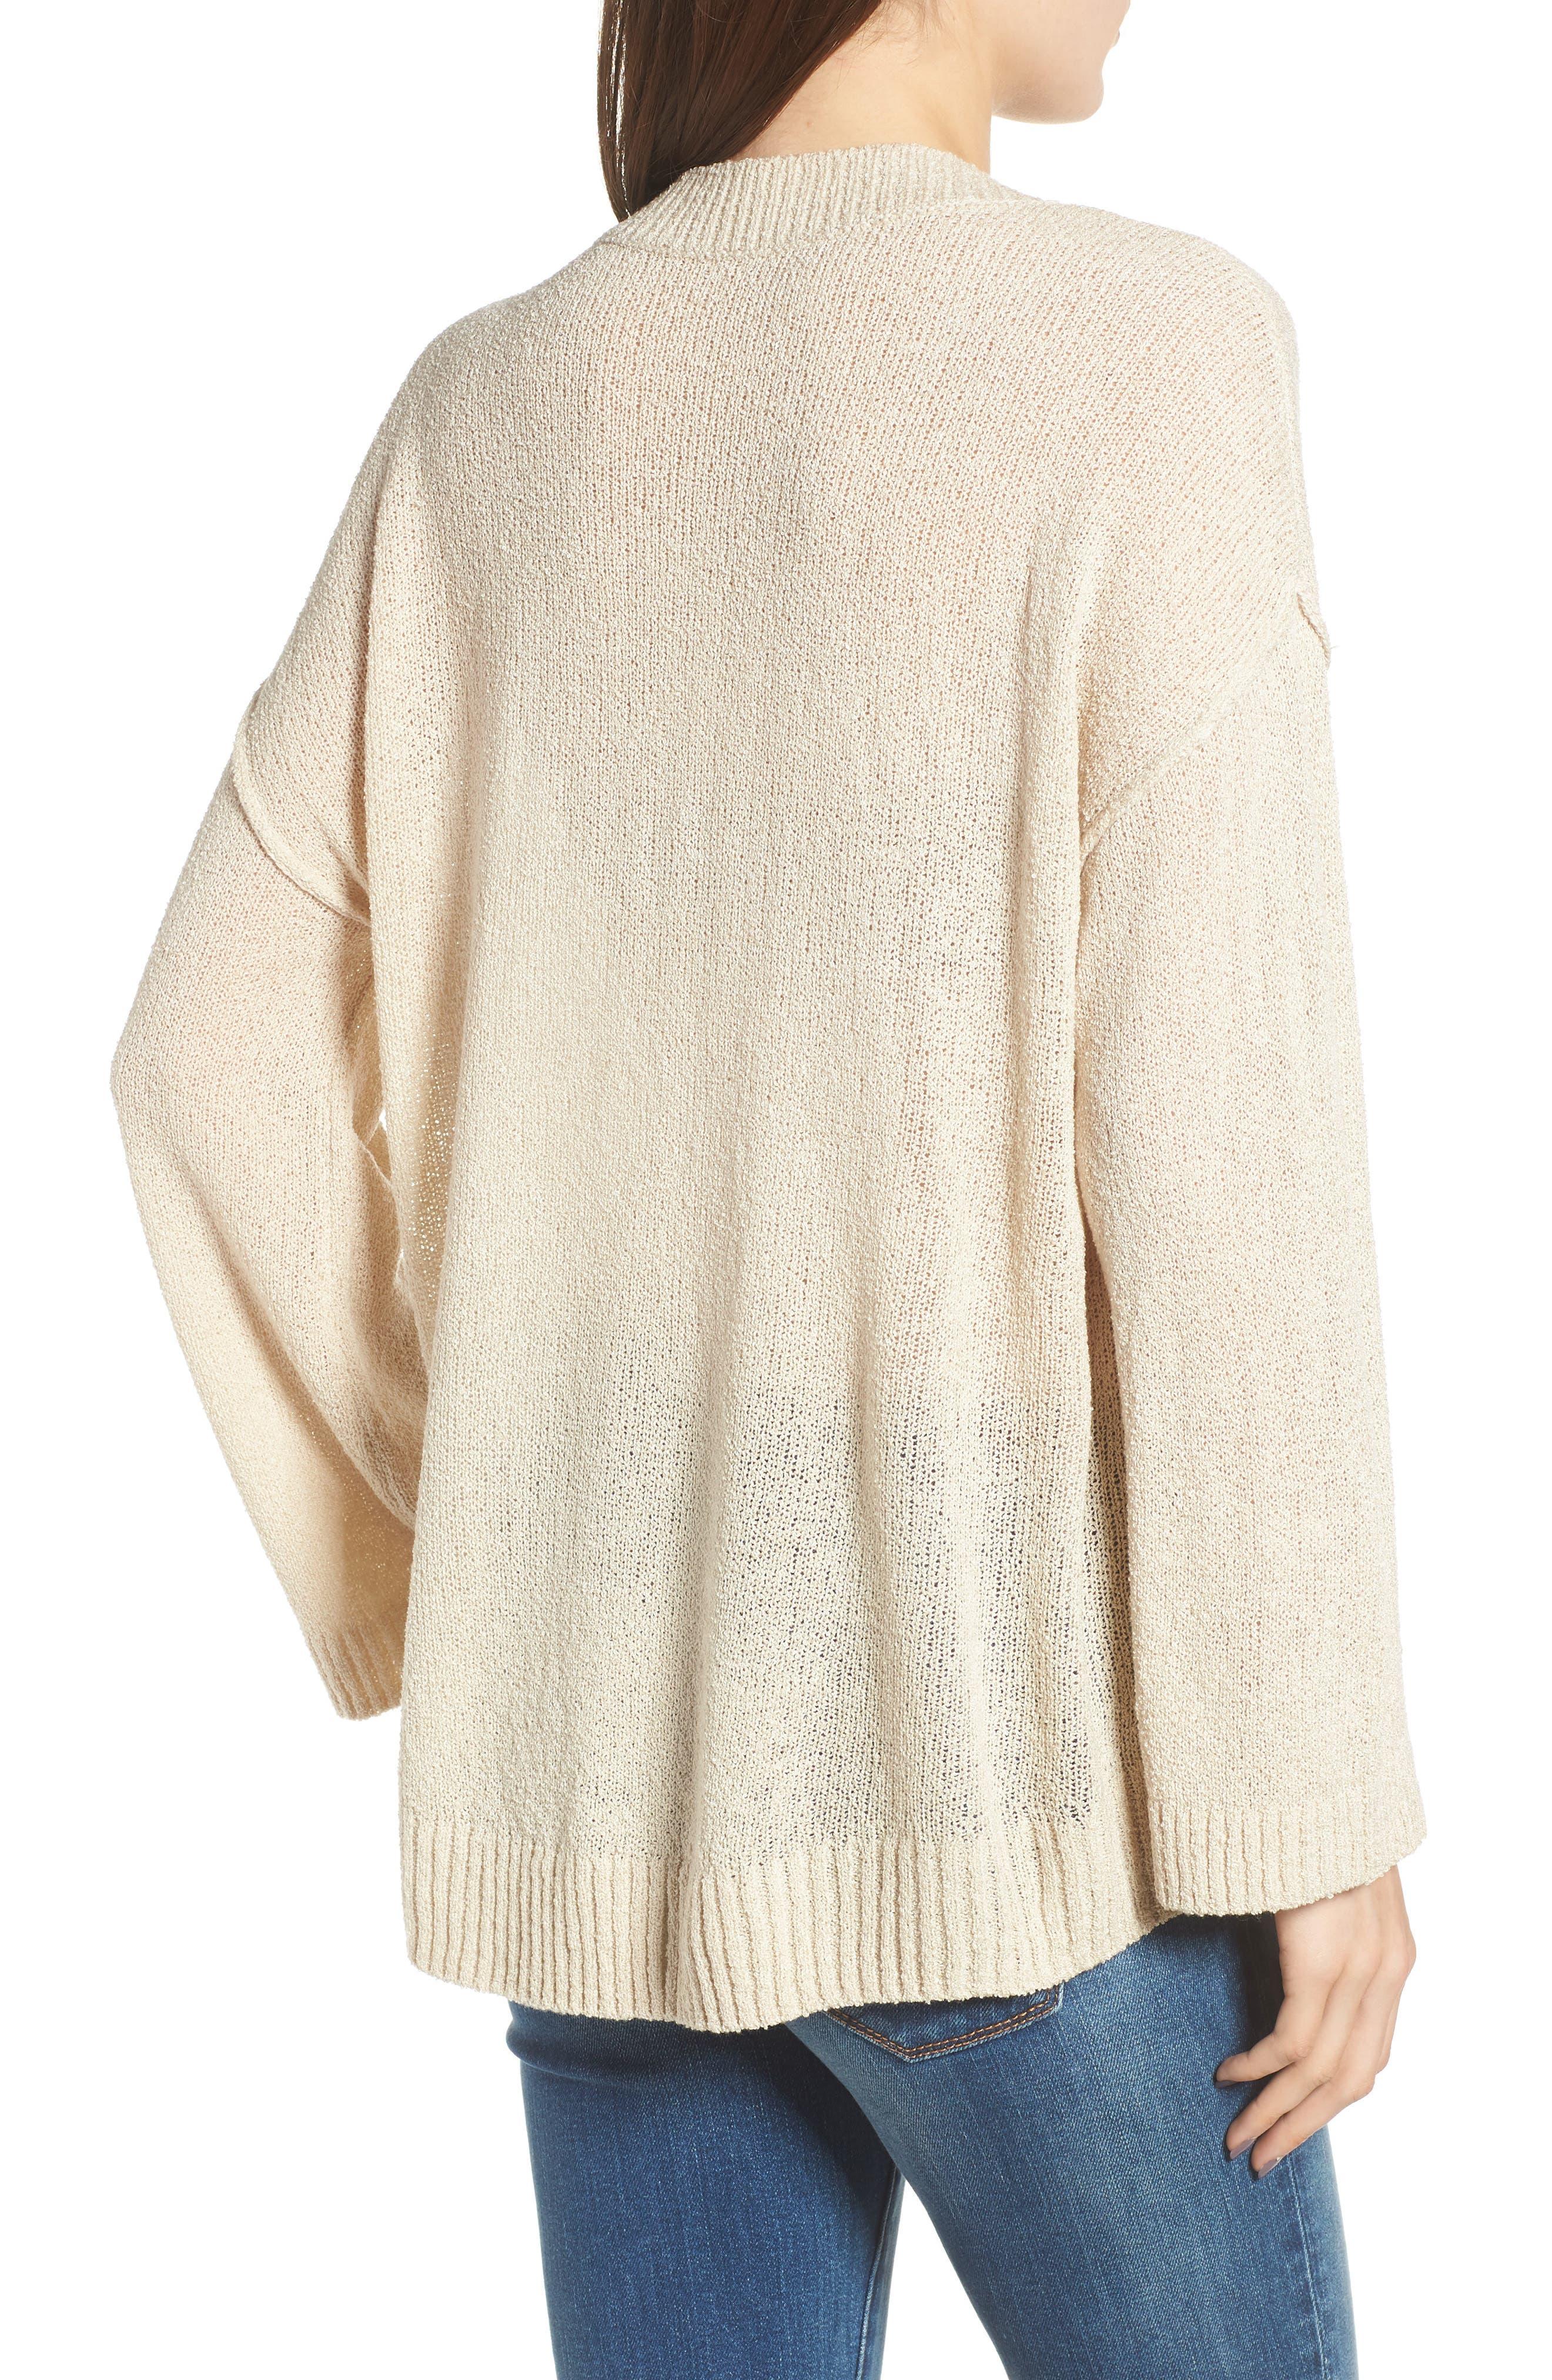 Exposed Seam Sweater,                             Alternate thumbnail 2, color,                             Beige Birch